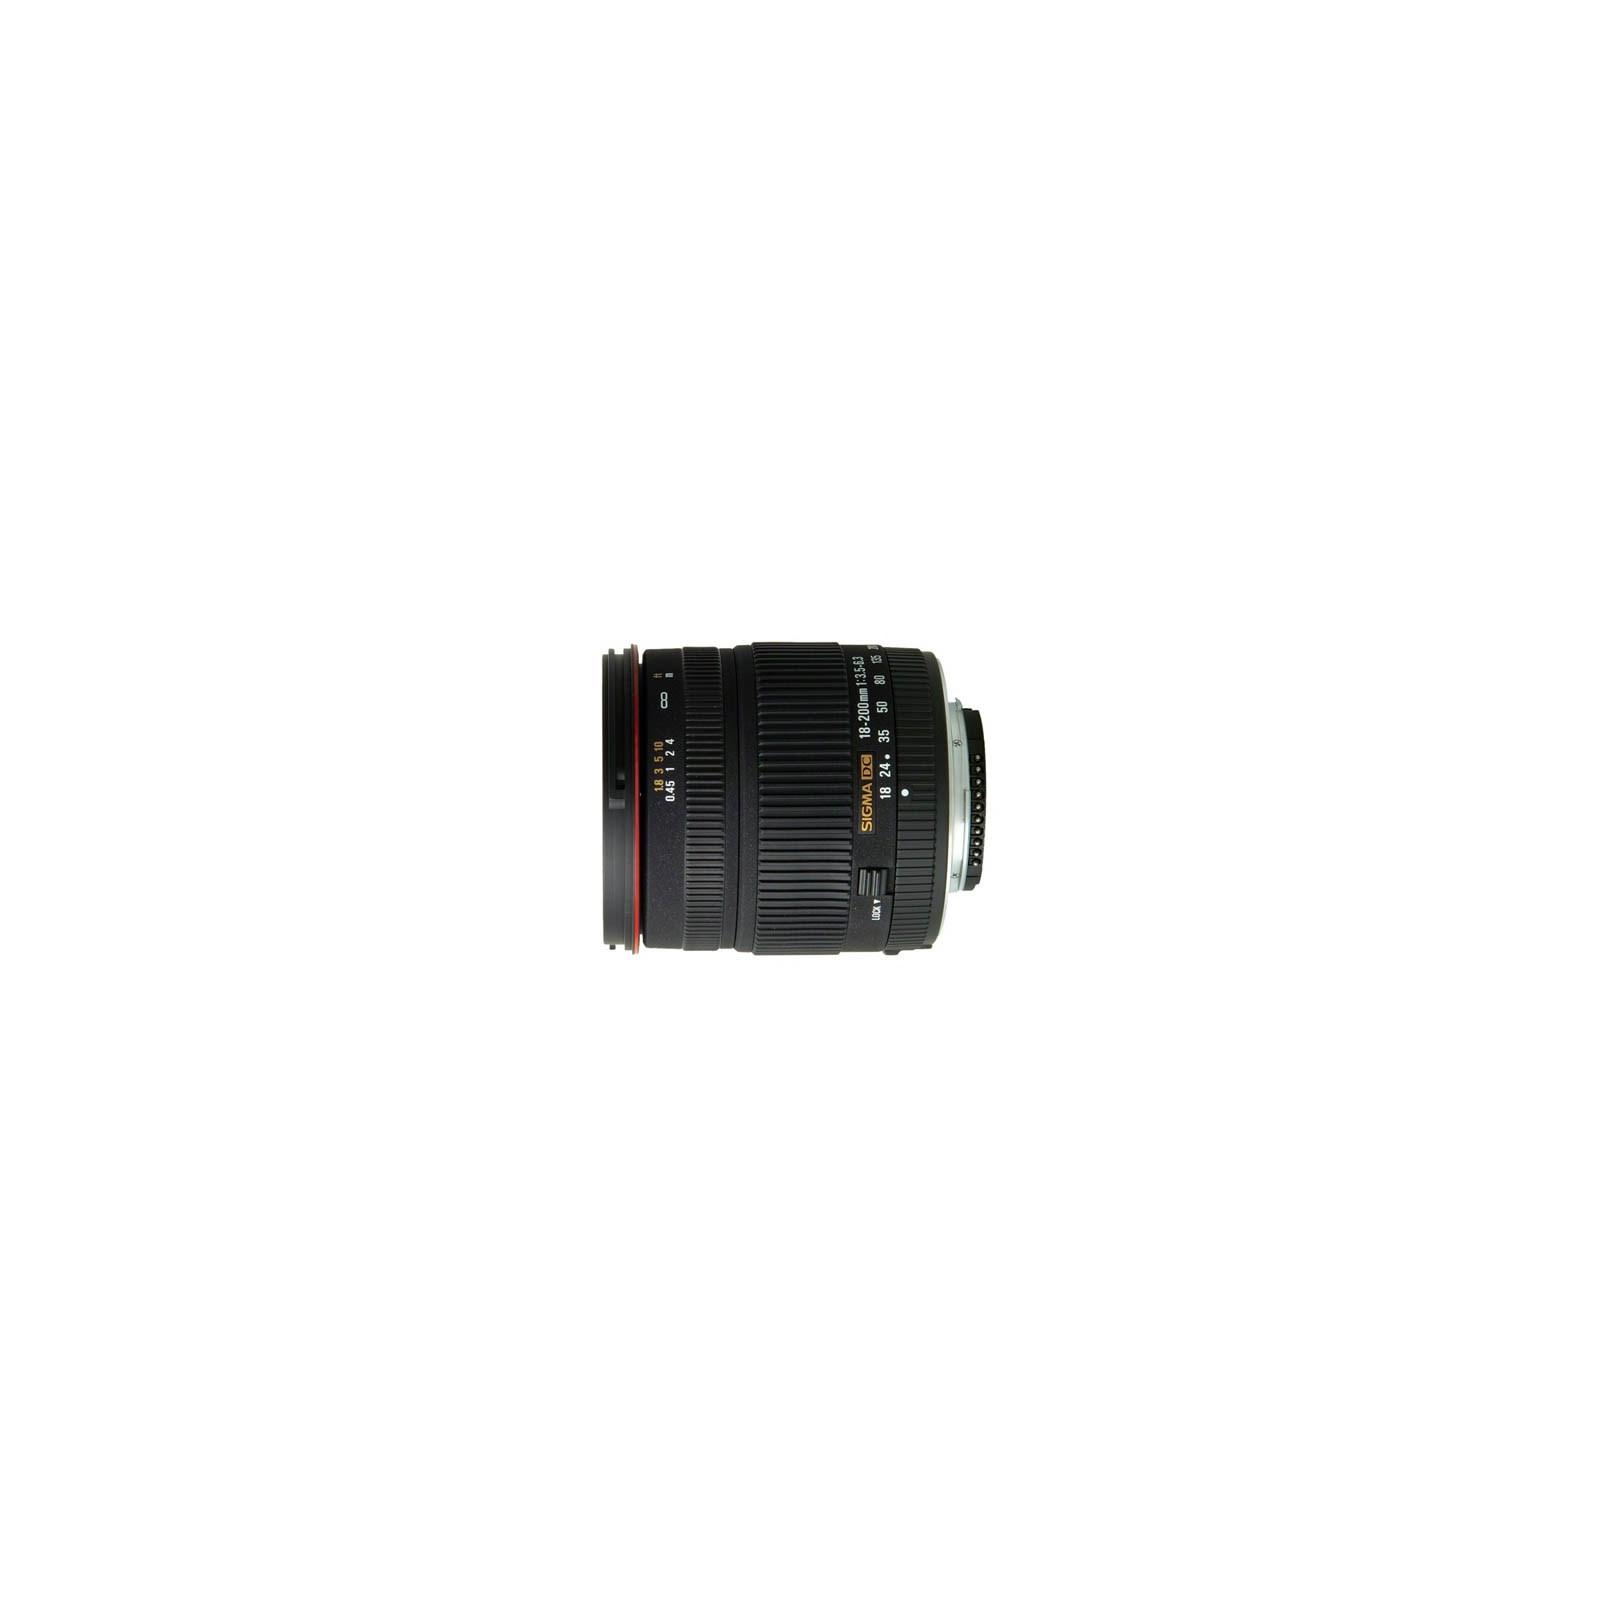 Объектив Sigma 18-200mm f/3.5-6.3 II DC OS for Canon (882954)